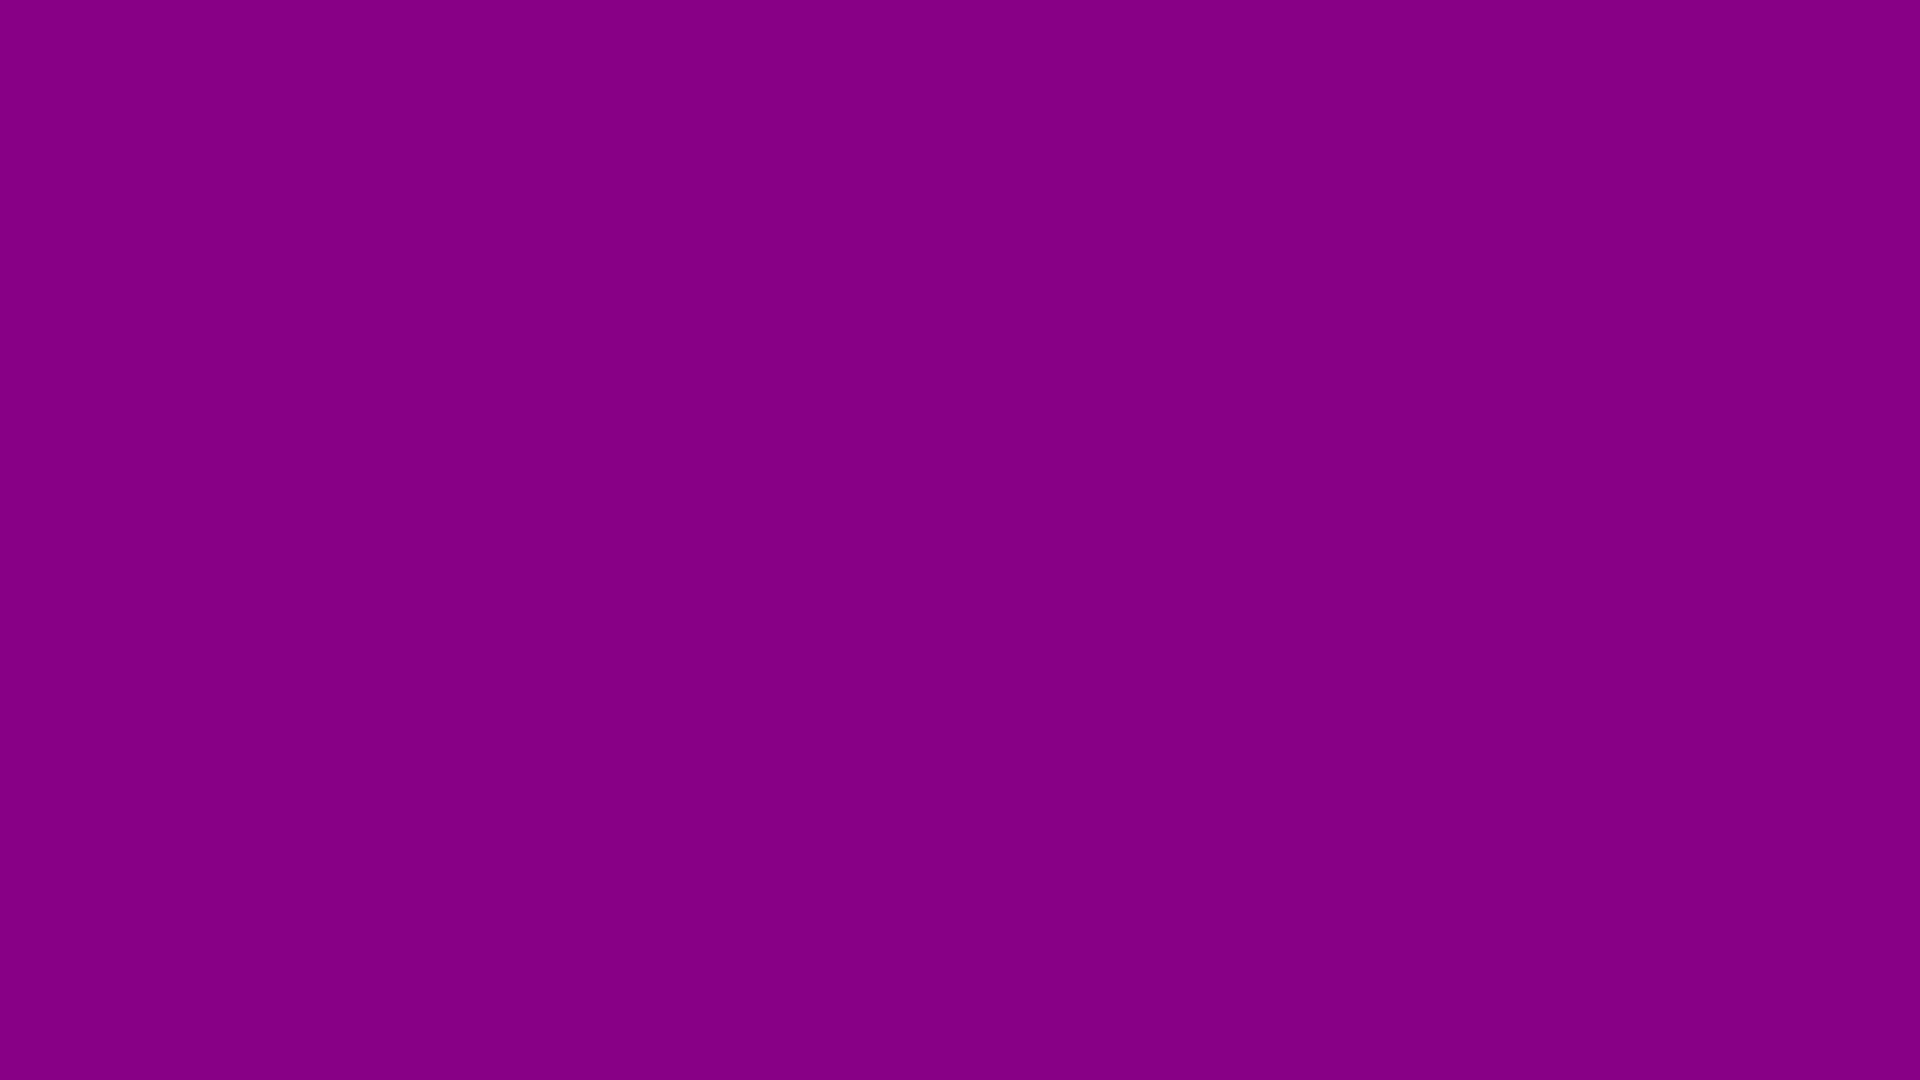 1920x1080 Mardi Gras Solid Color Background